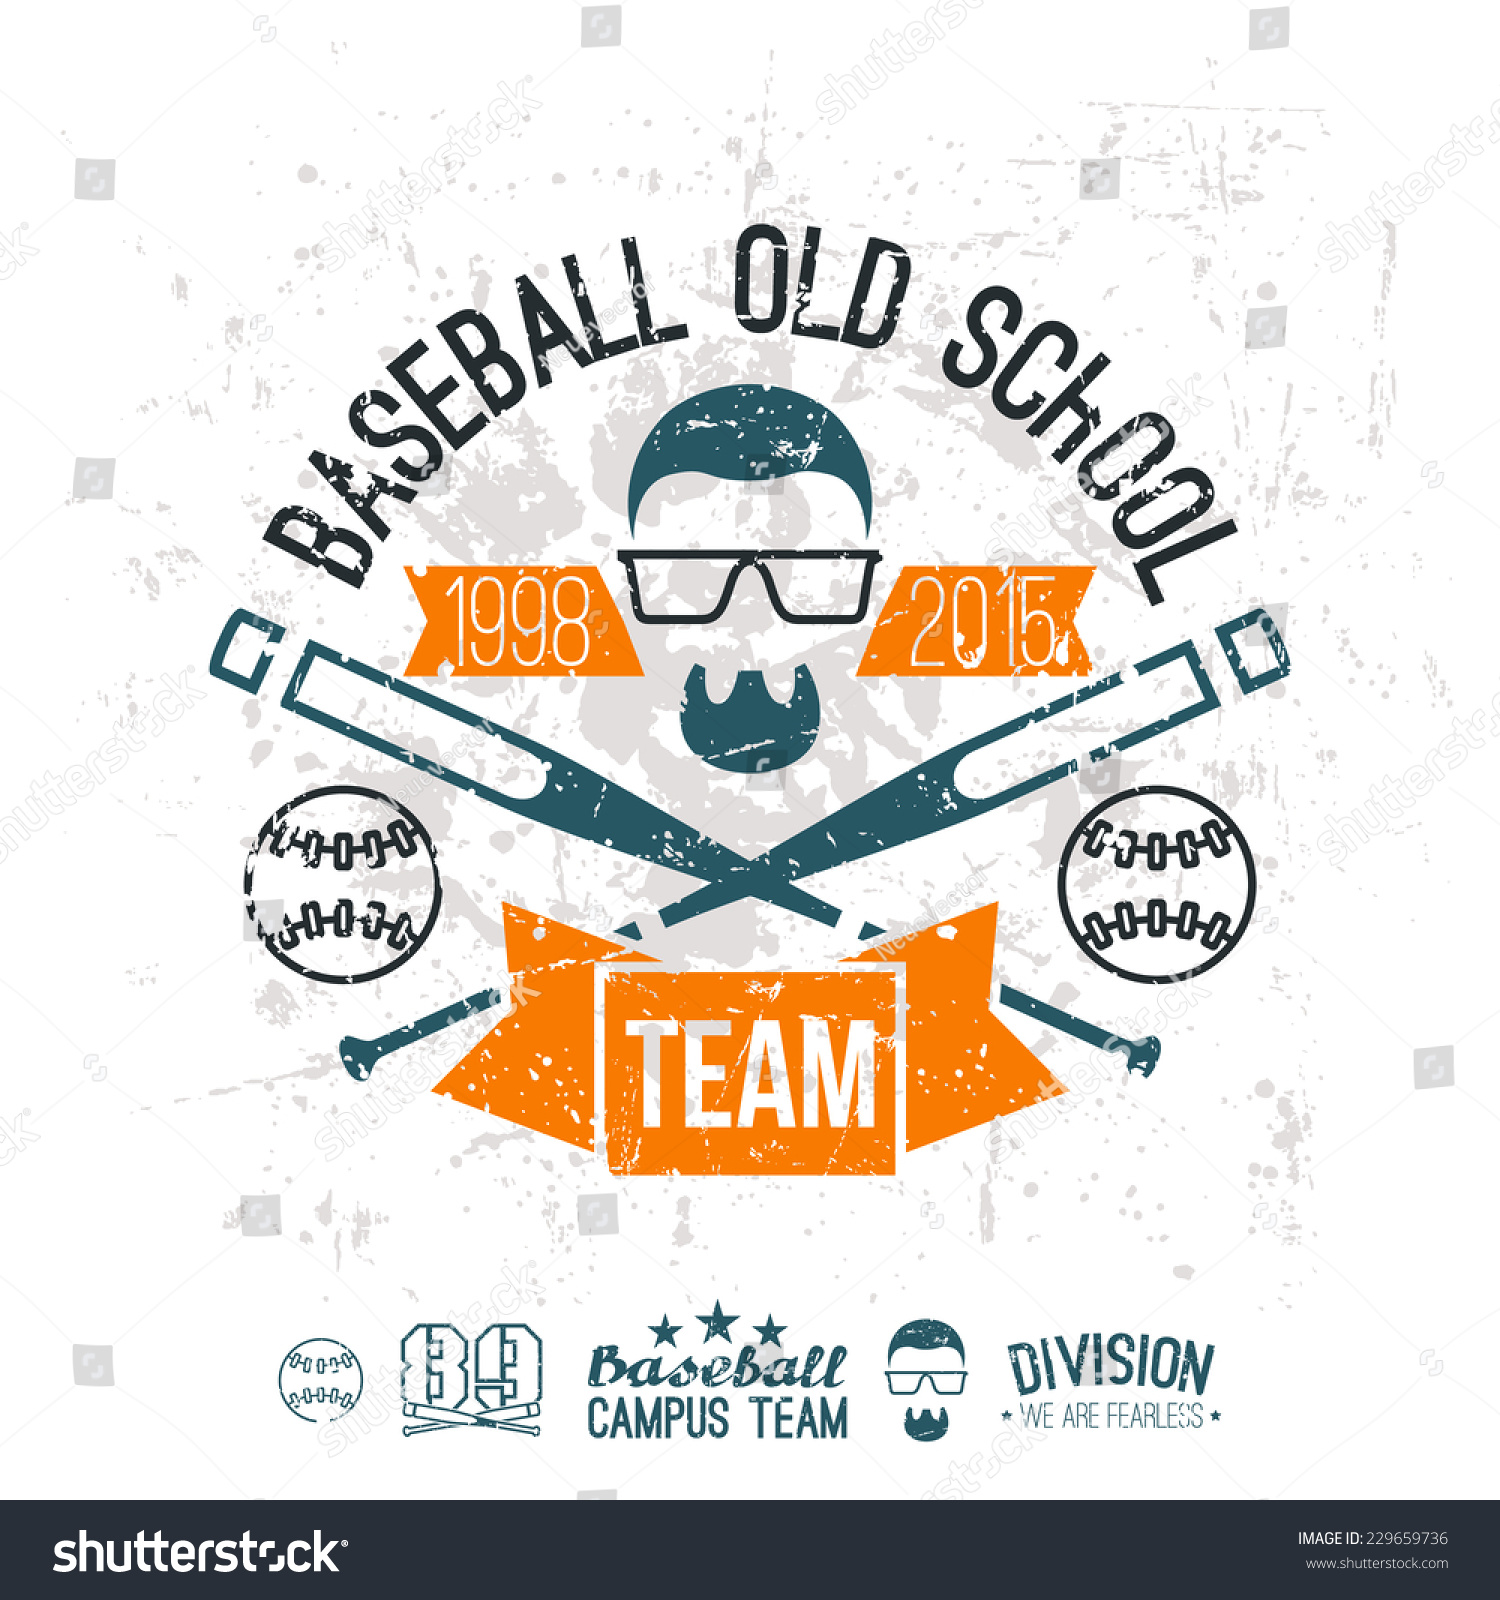 Emblem Baseball Team Graphic Design For T Shirt Color Print On A White